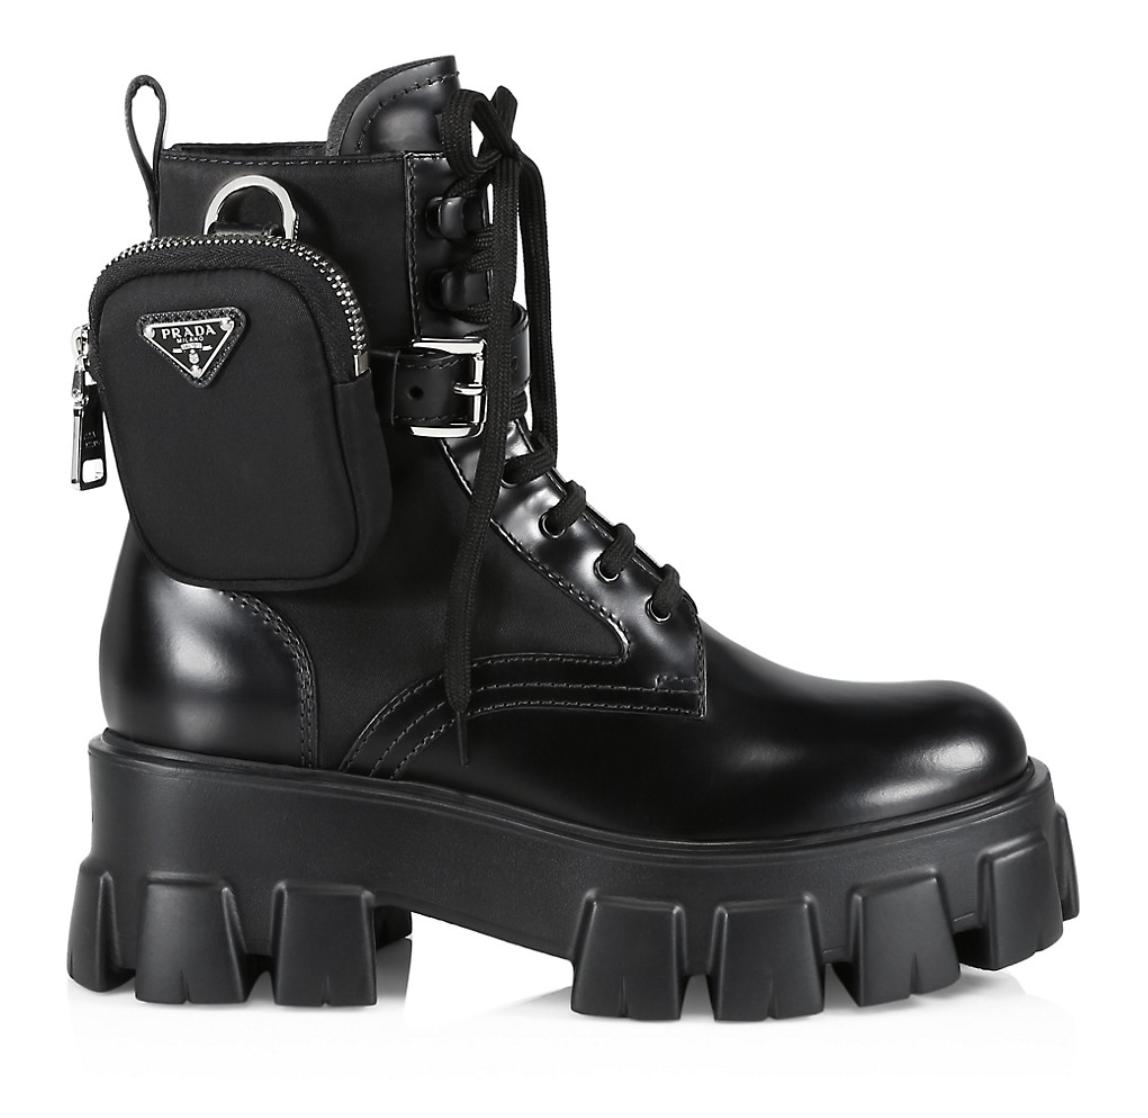 Prada, lug-sole boots